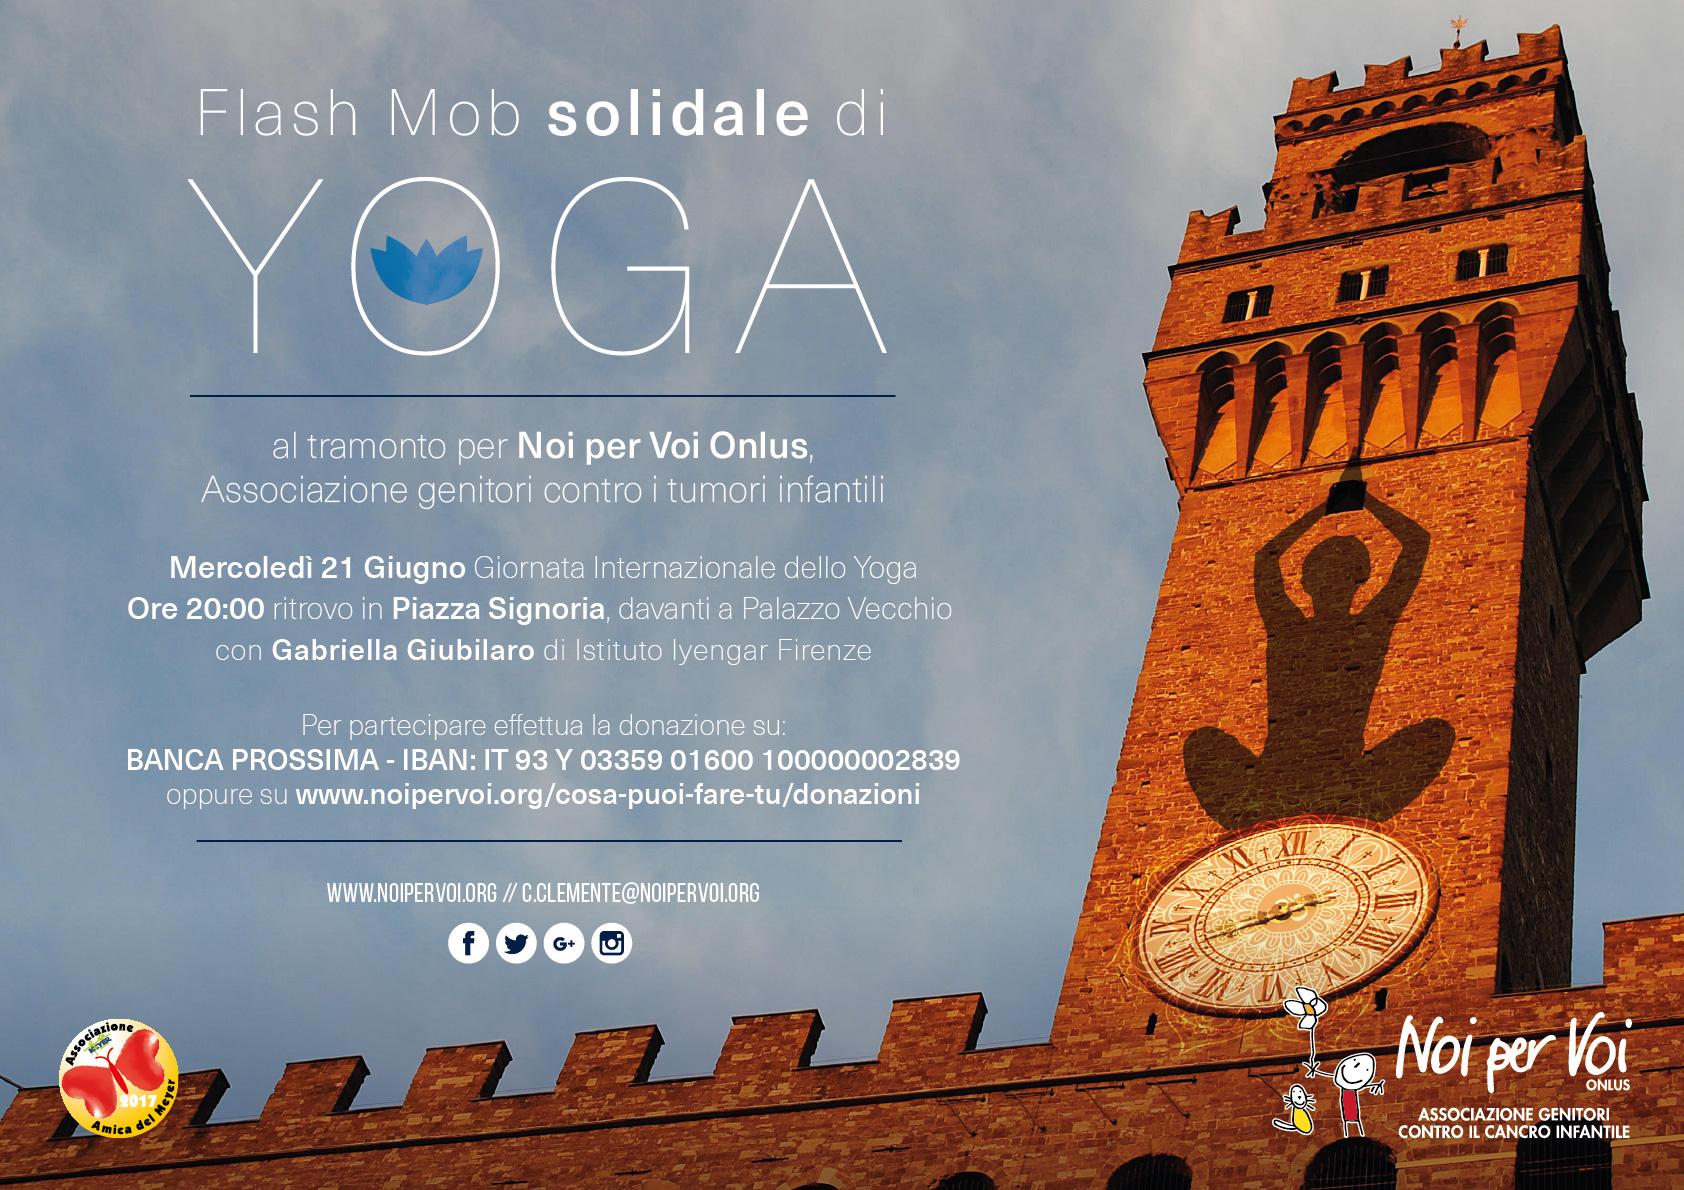 Yoga Solidale